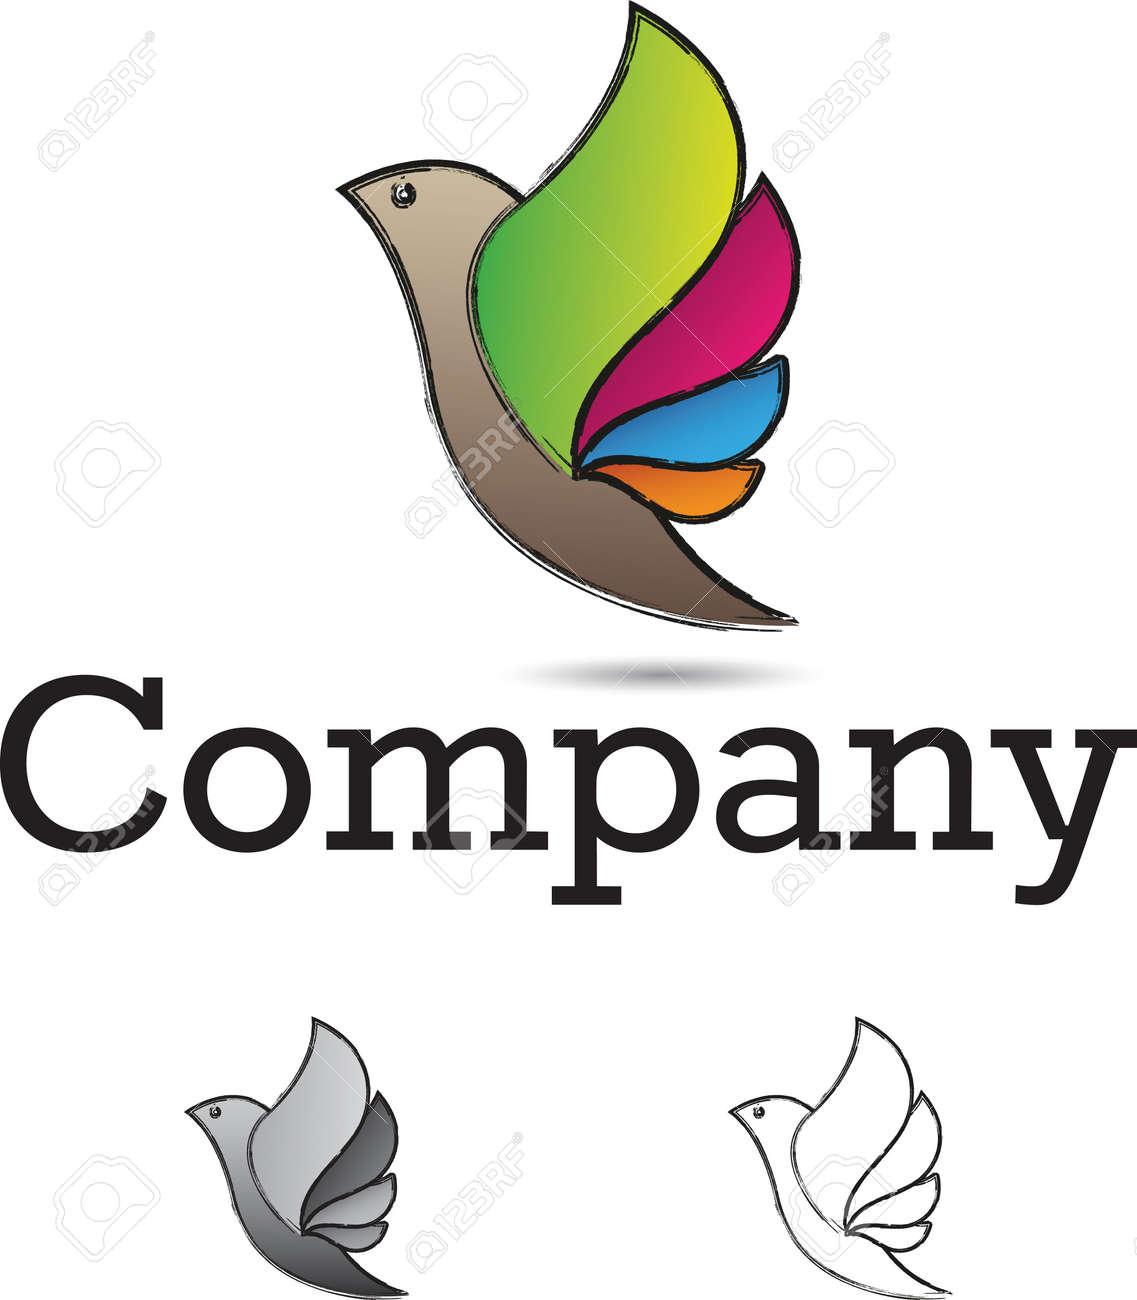 Colorful and stylized flying bird logo design element Stock Photo - 20880901